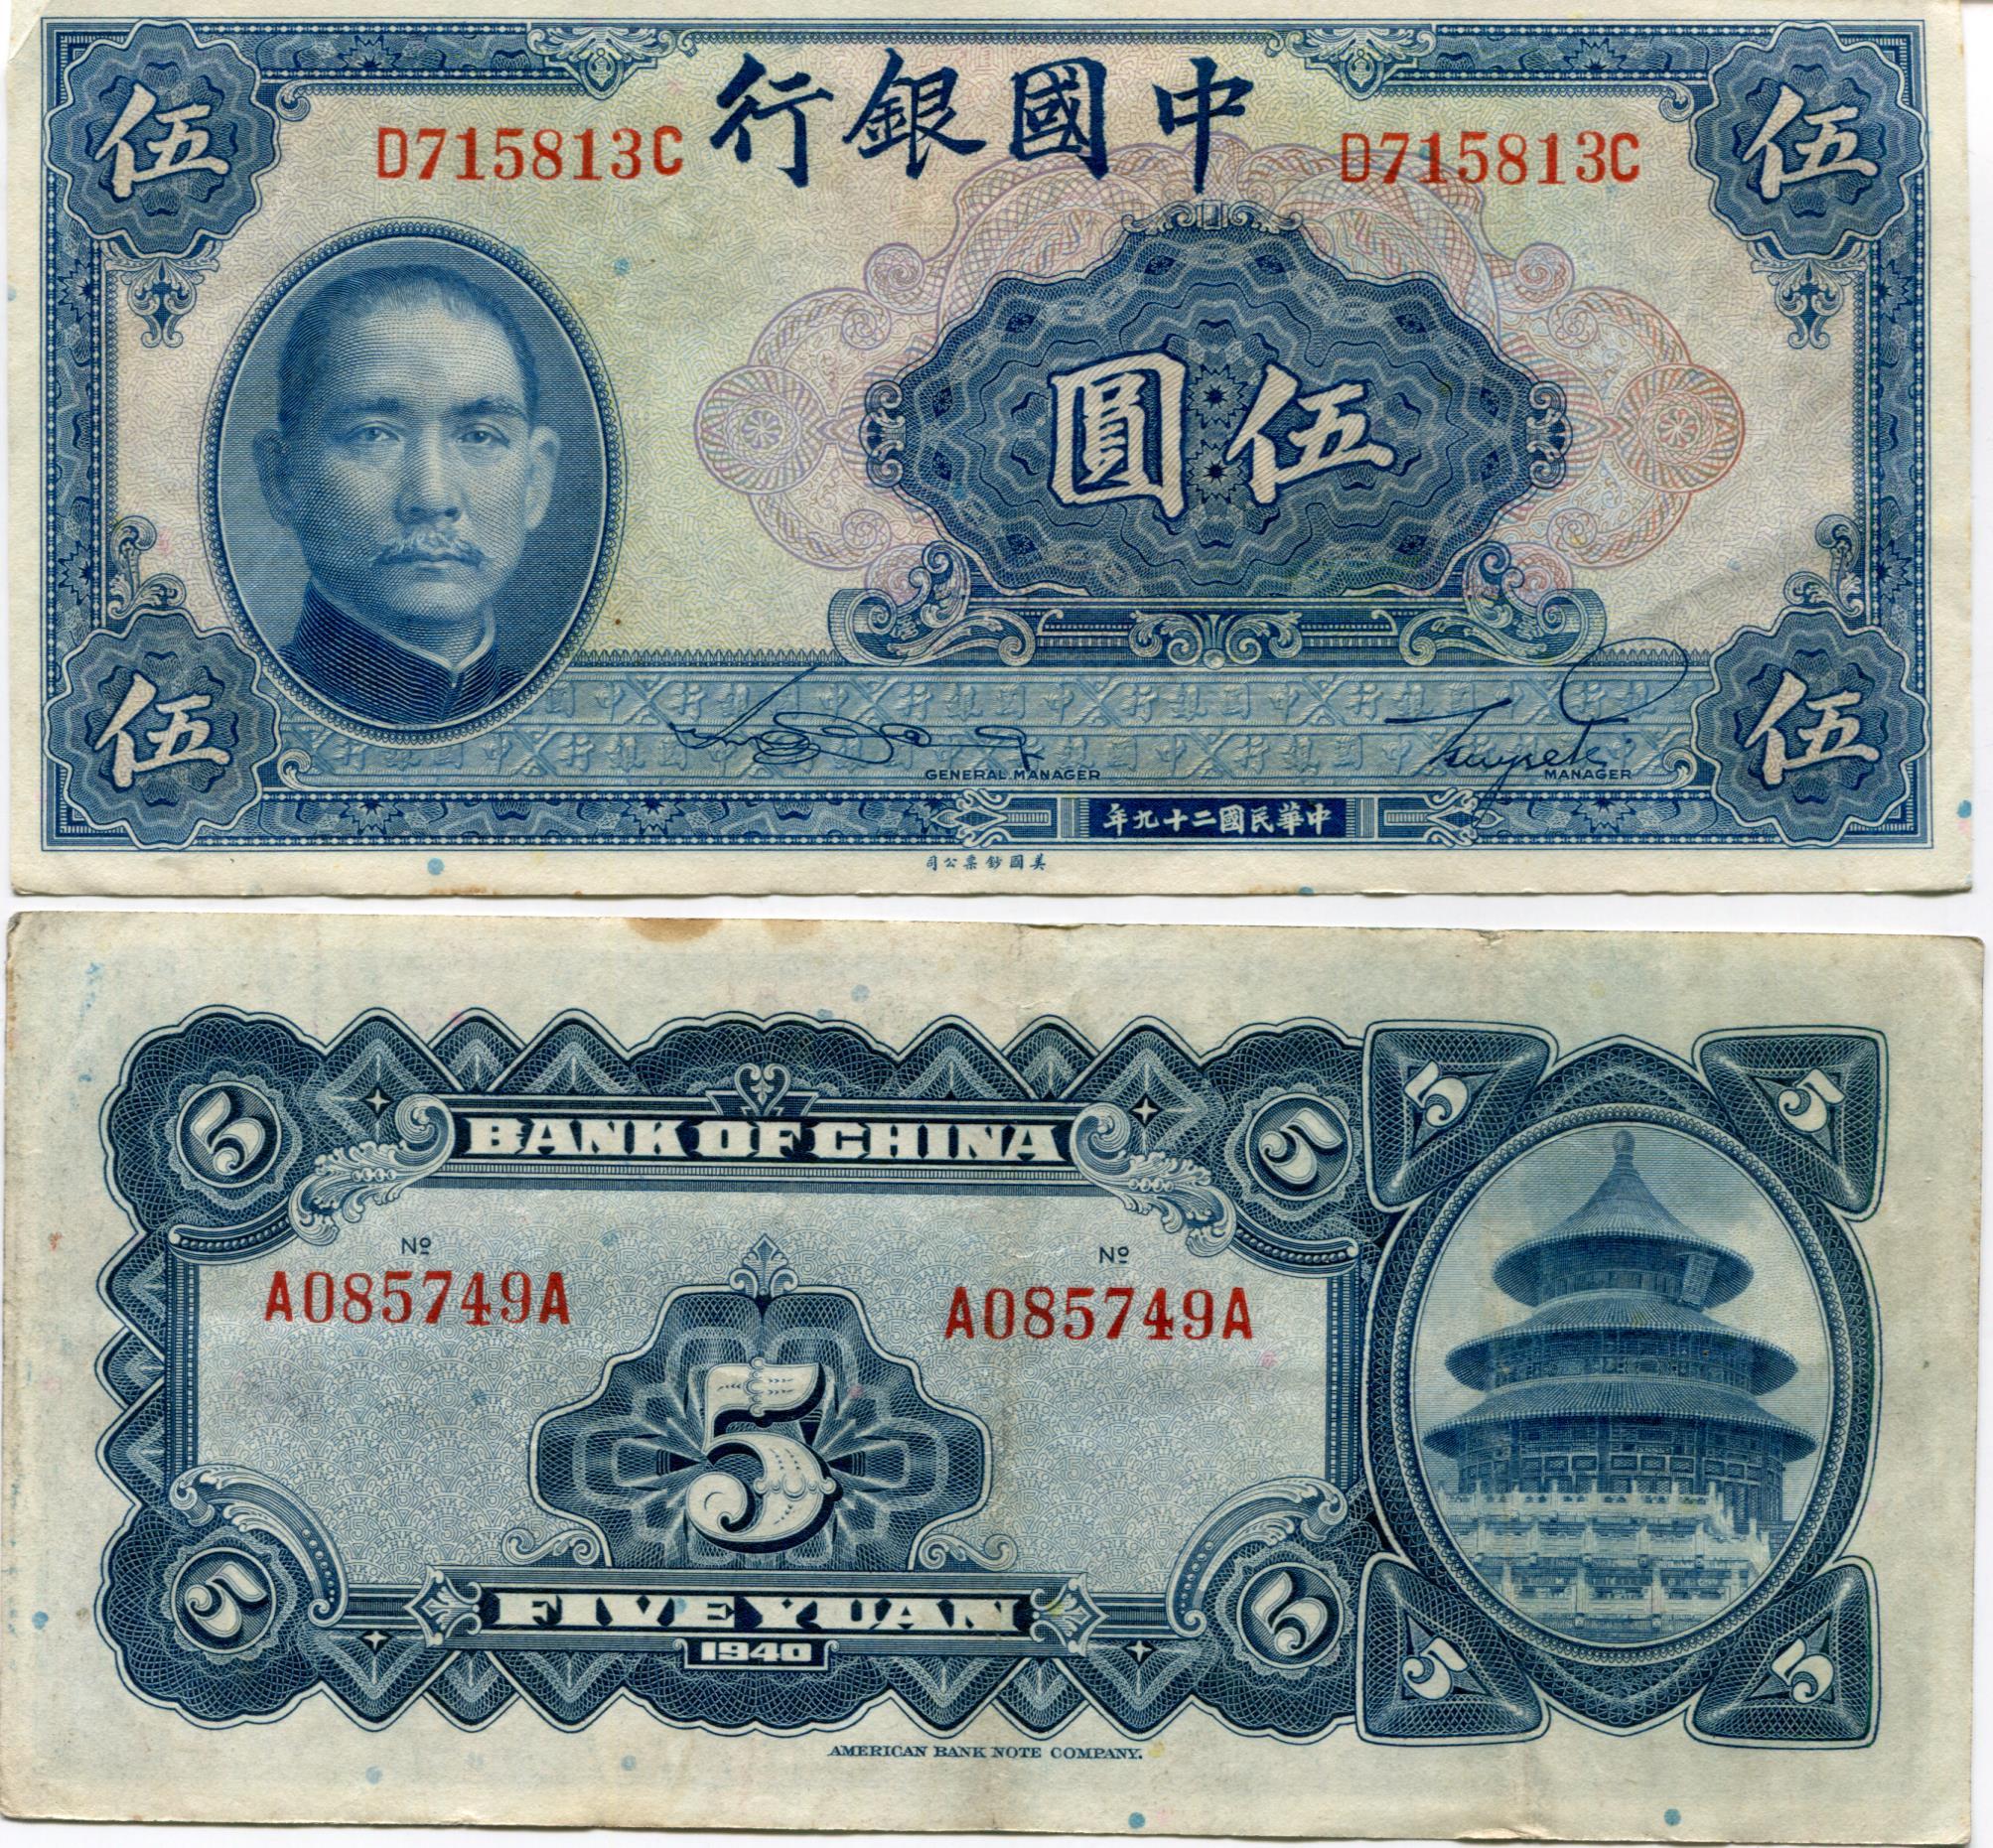 Hell bank note ten thousand made in Hong Kong approx 100